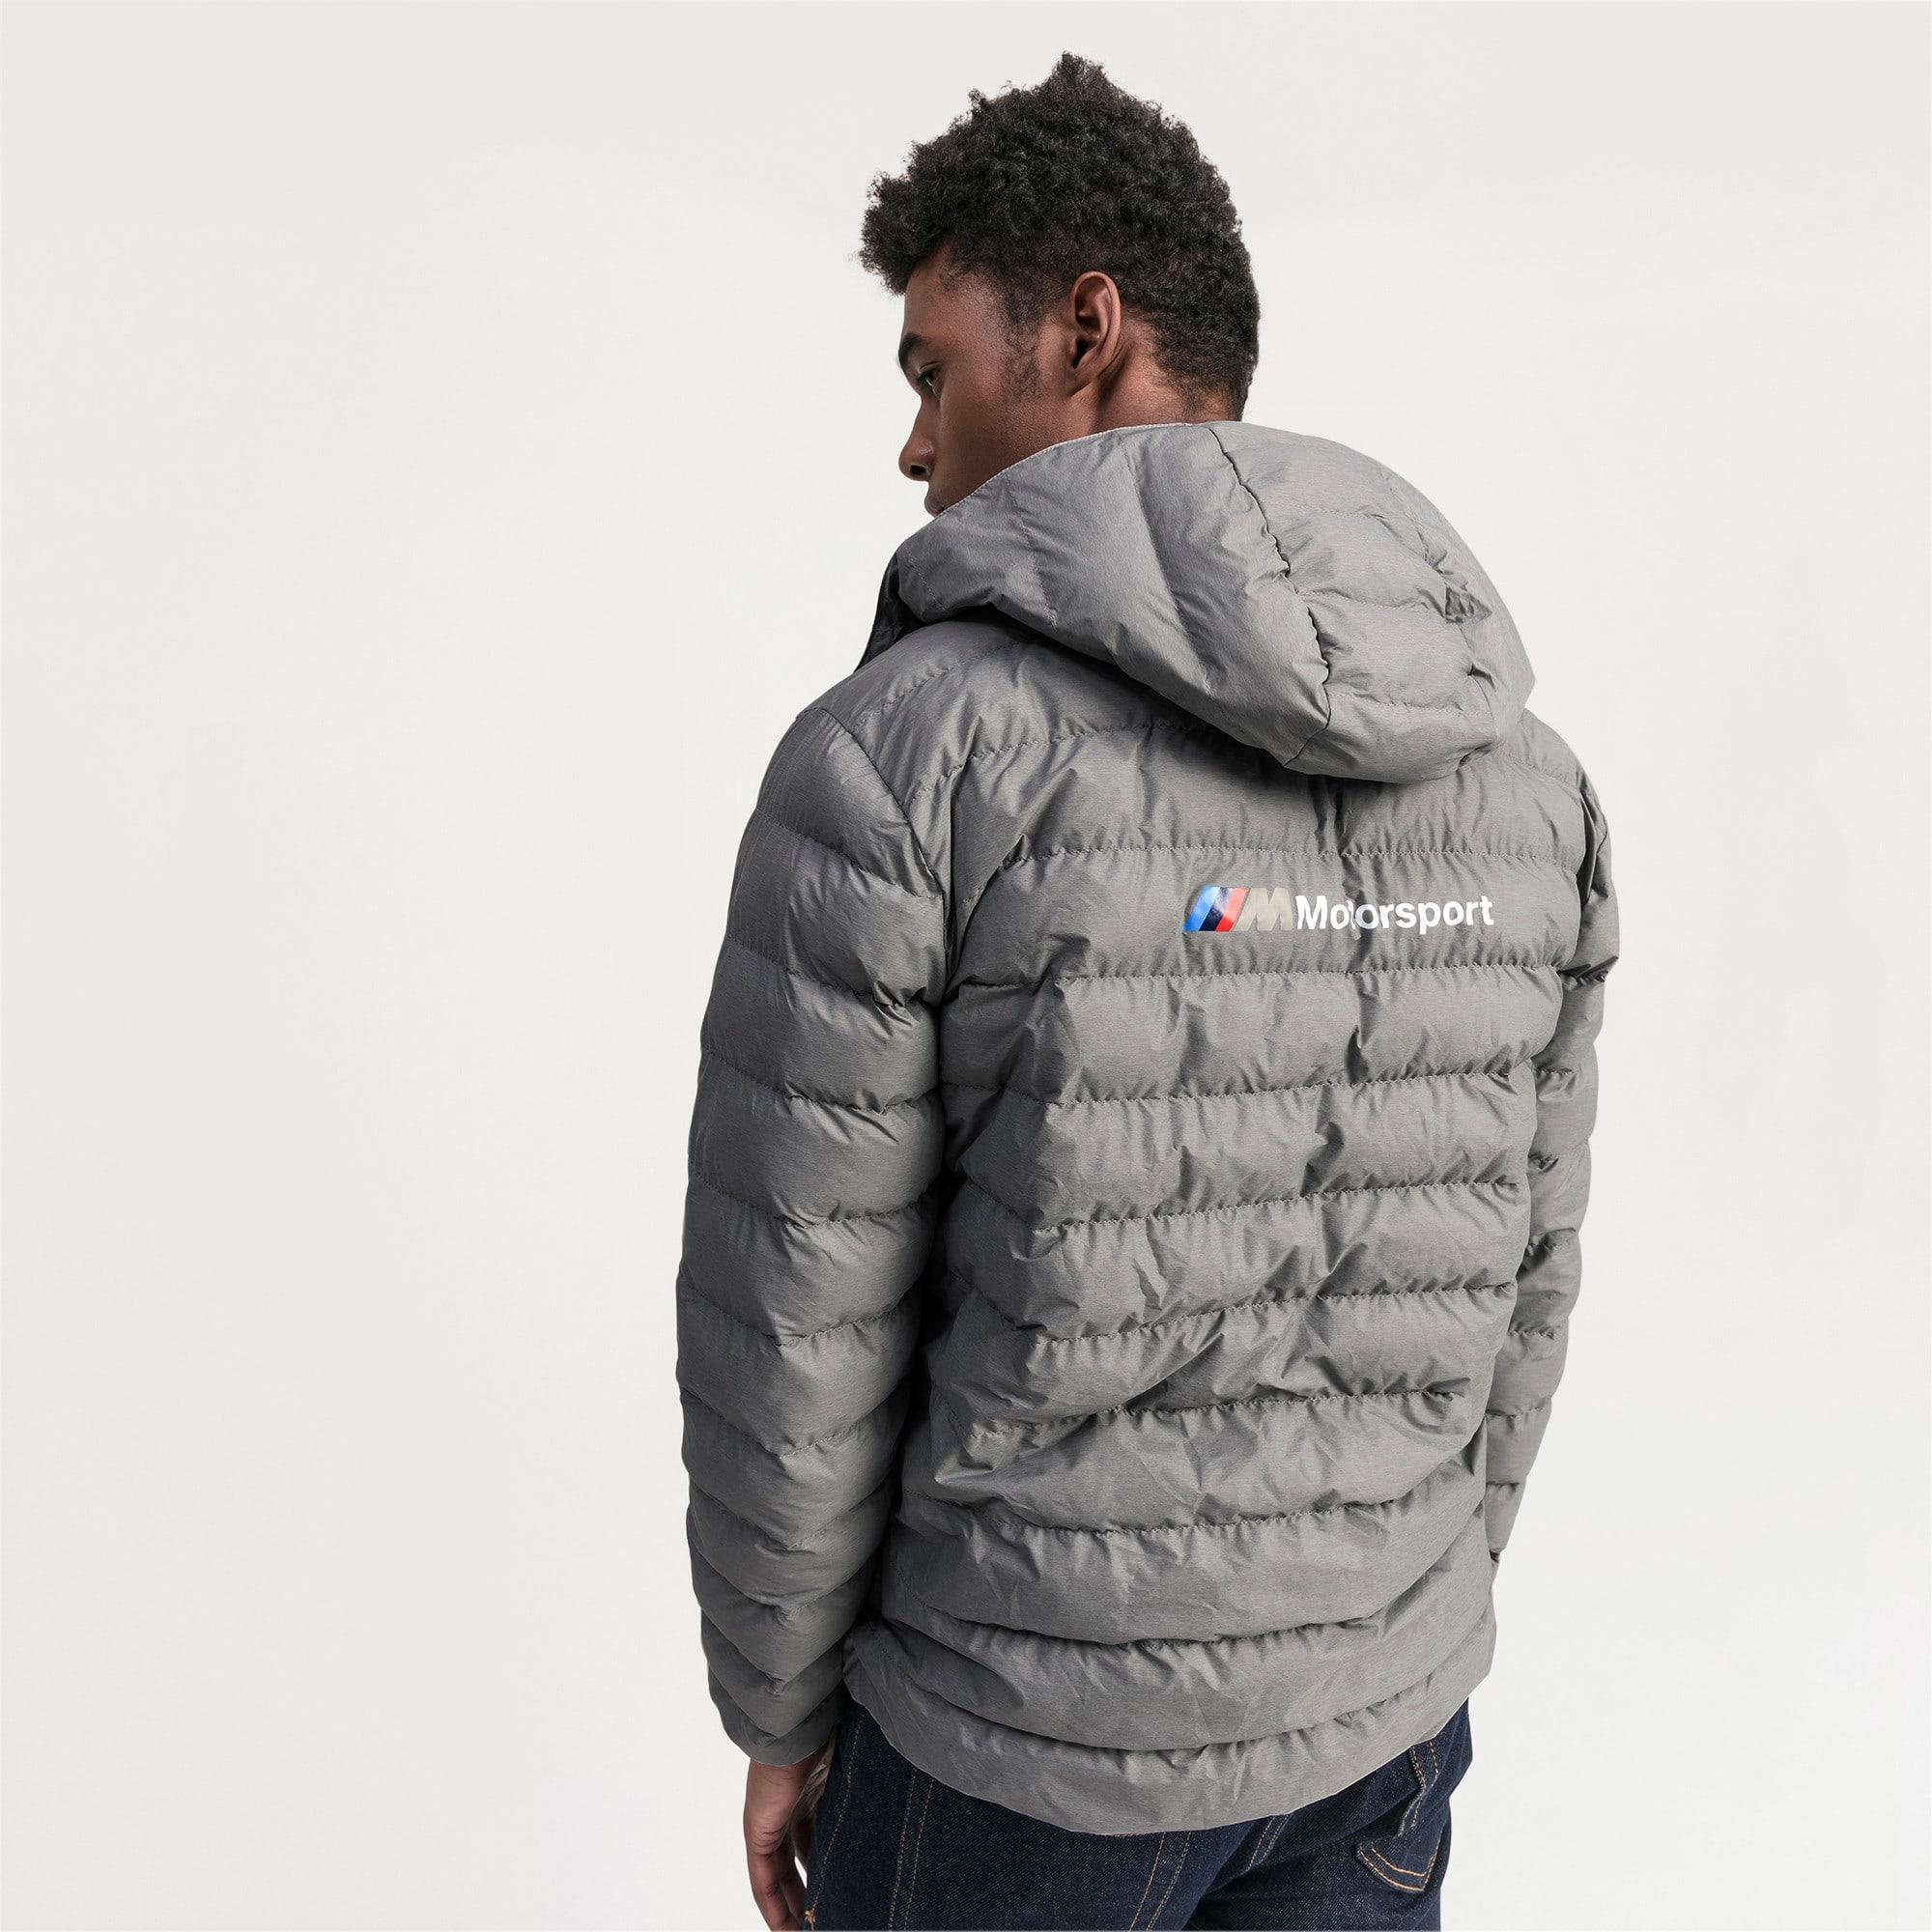 Thumbnail 2 of BMW Motorsport Eco PackLite Men's Jacket, Medium Gray Heather, medium